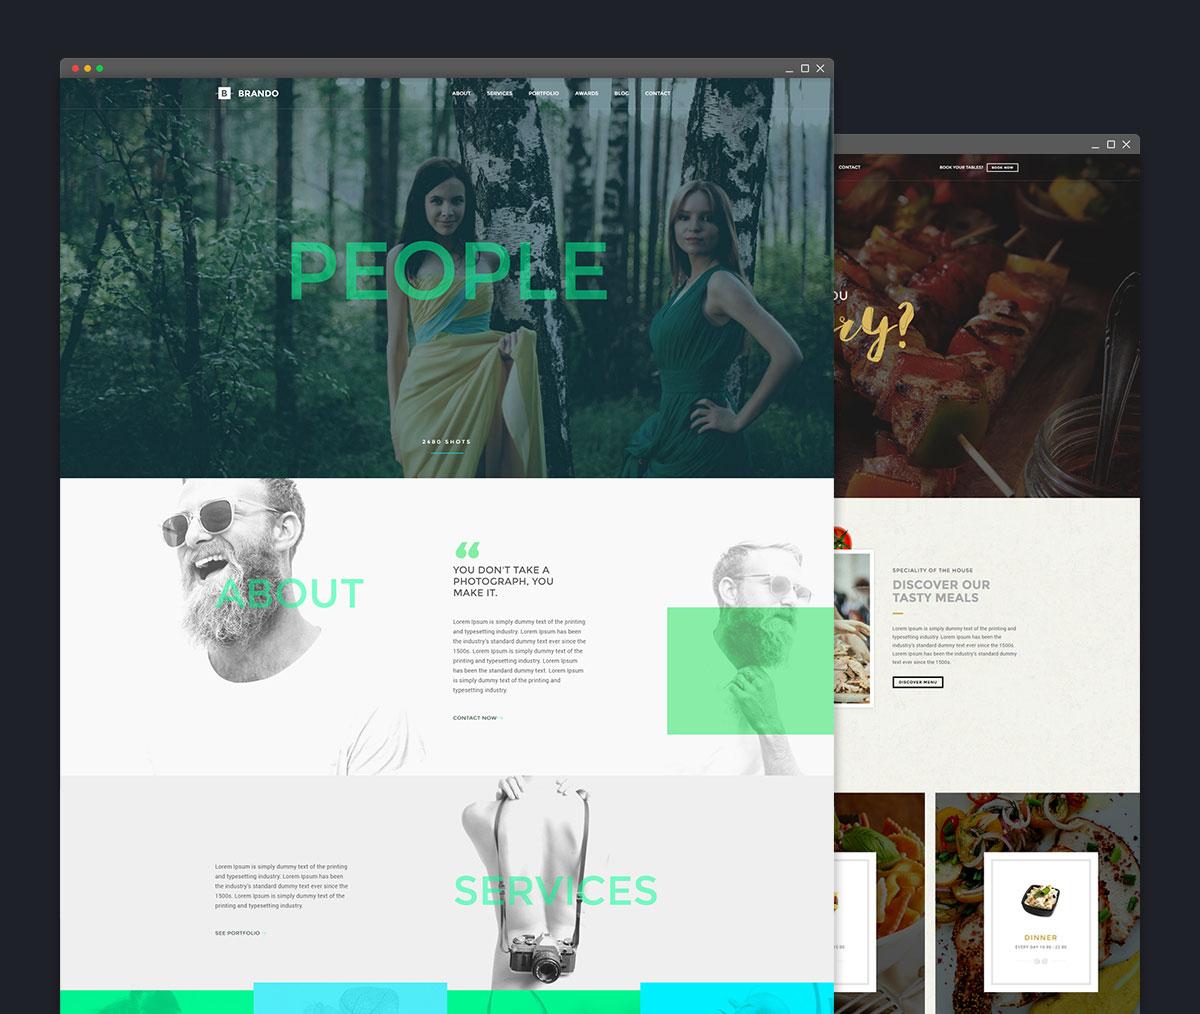 brando-popular-multipurpose-wordpress-themes